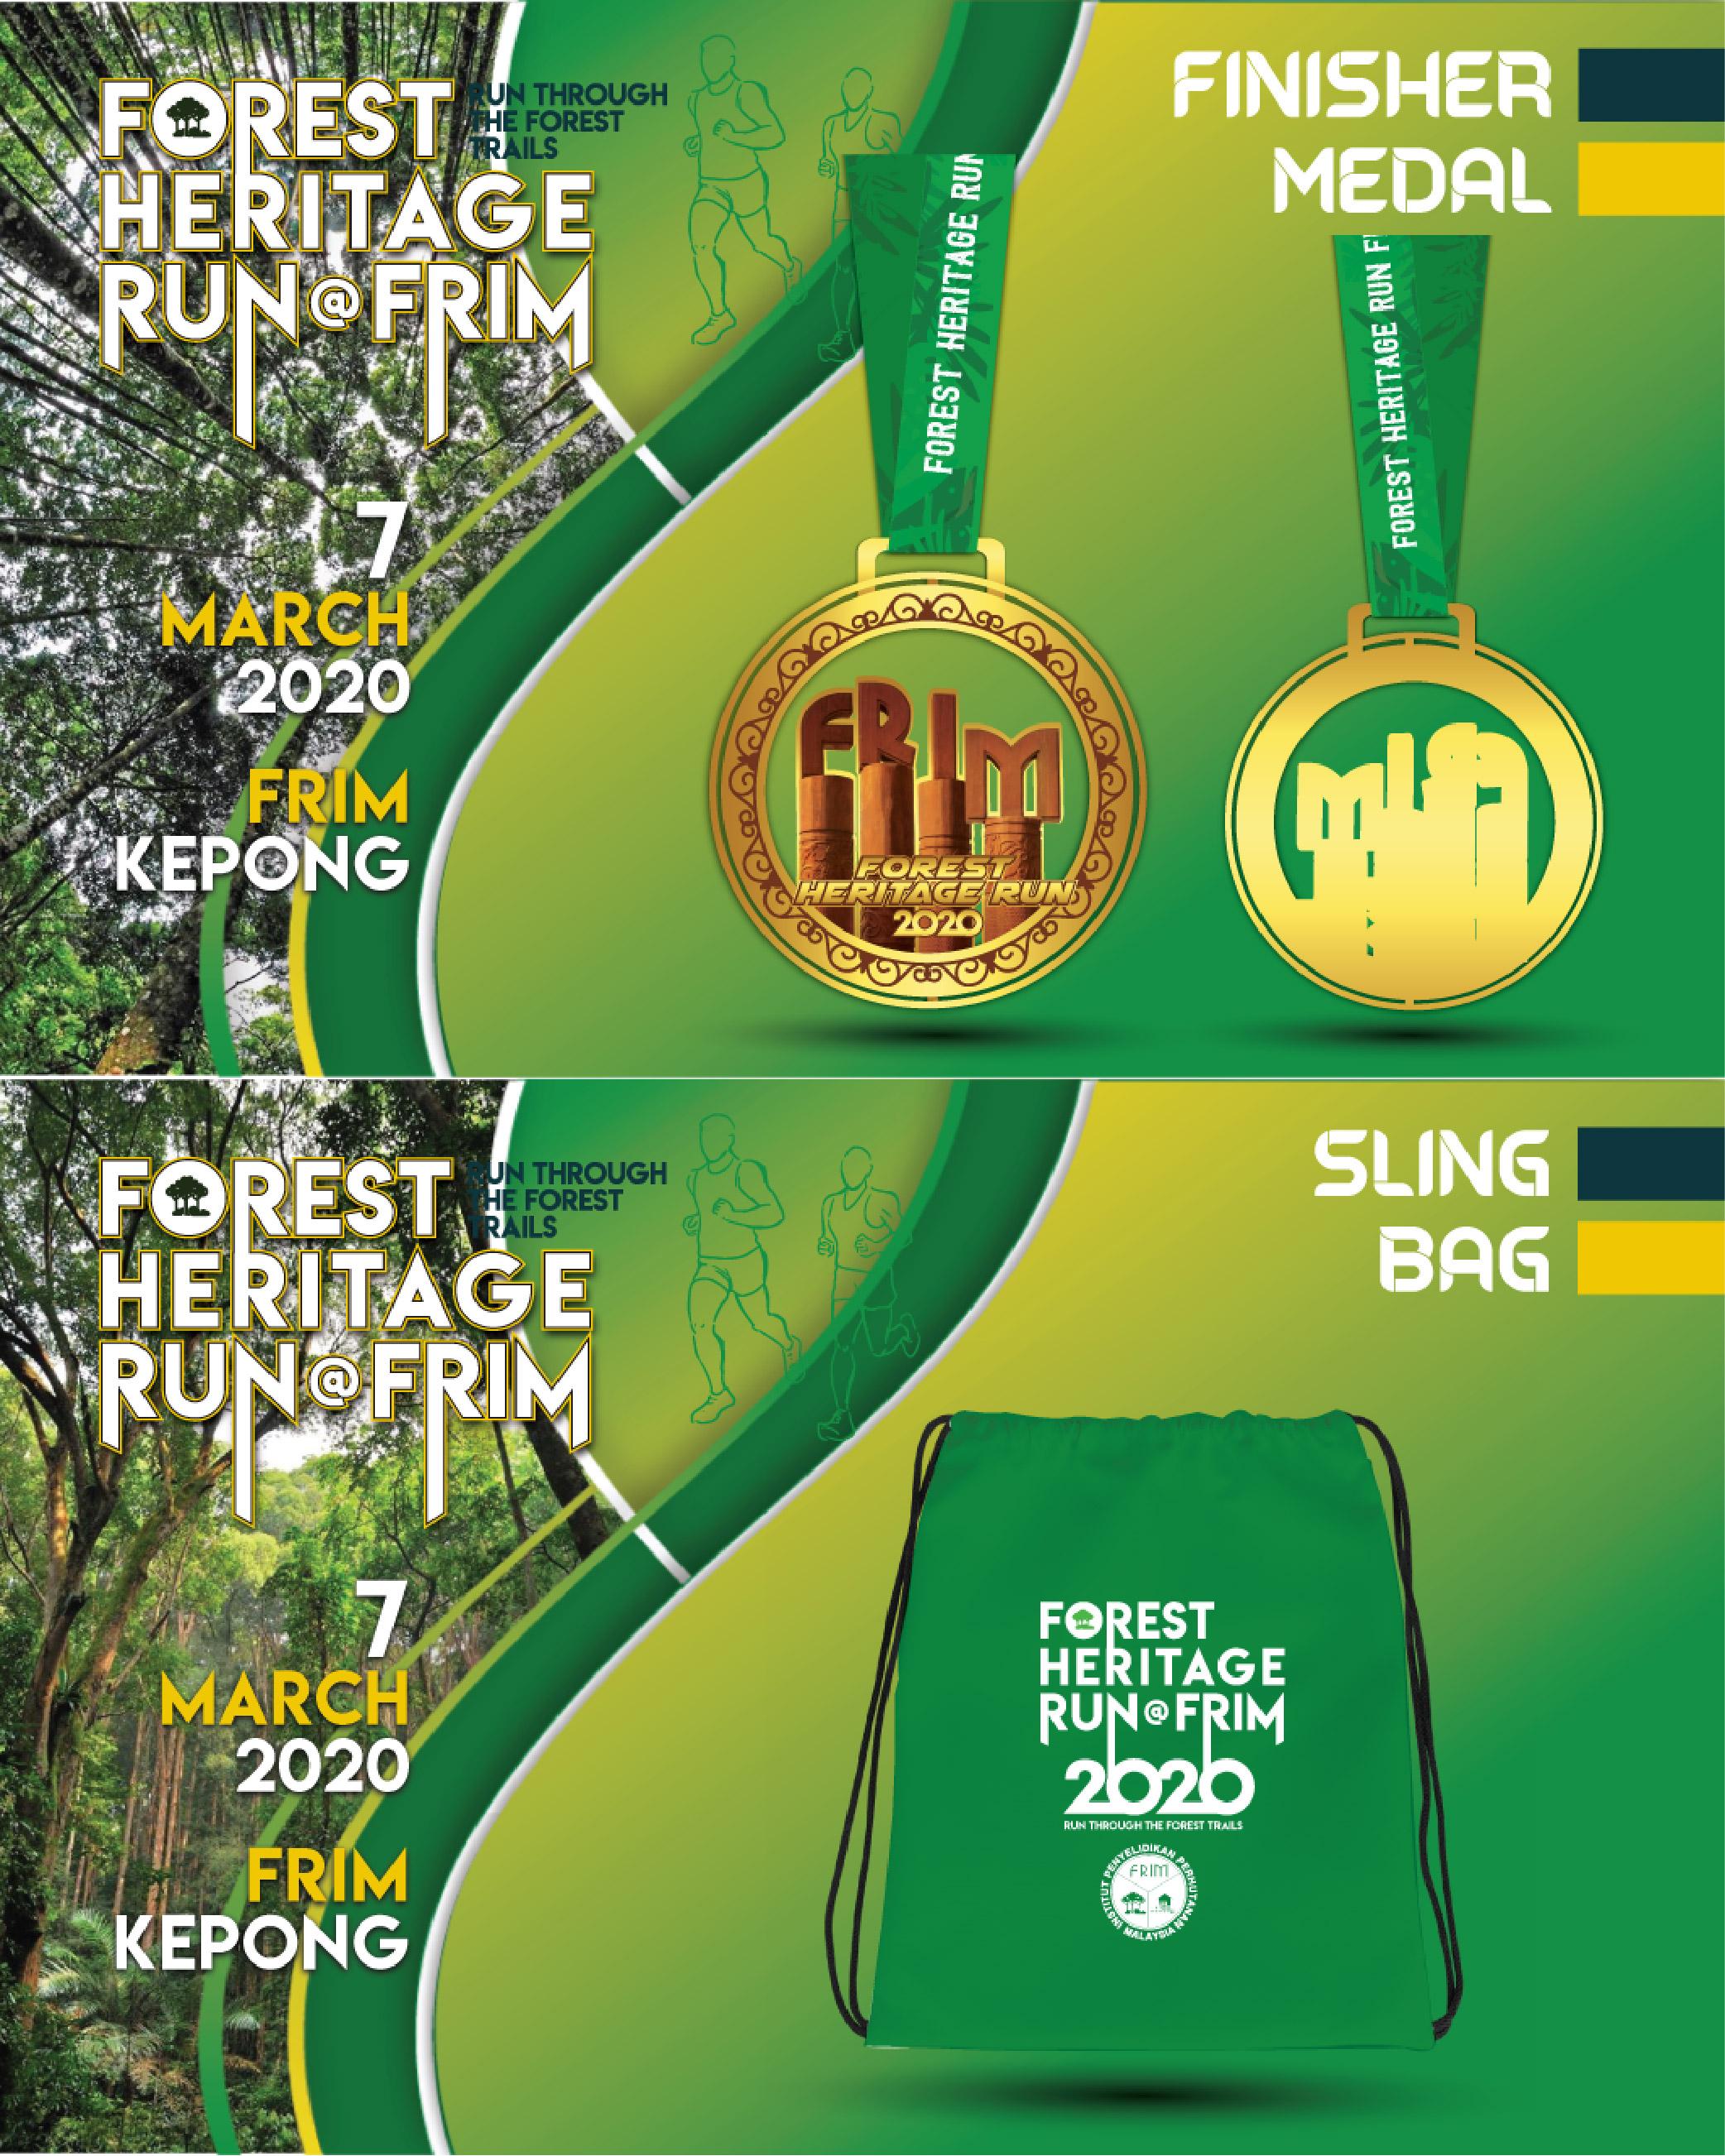 FOREST HERITAGE RUN @ FRIM 2020